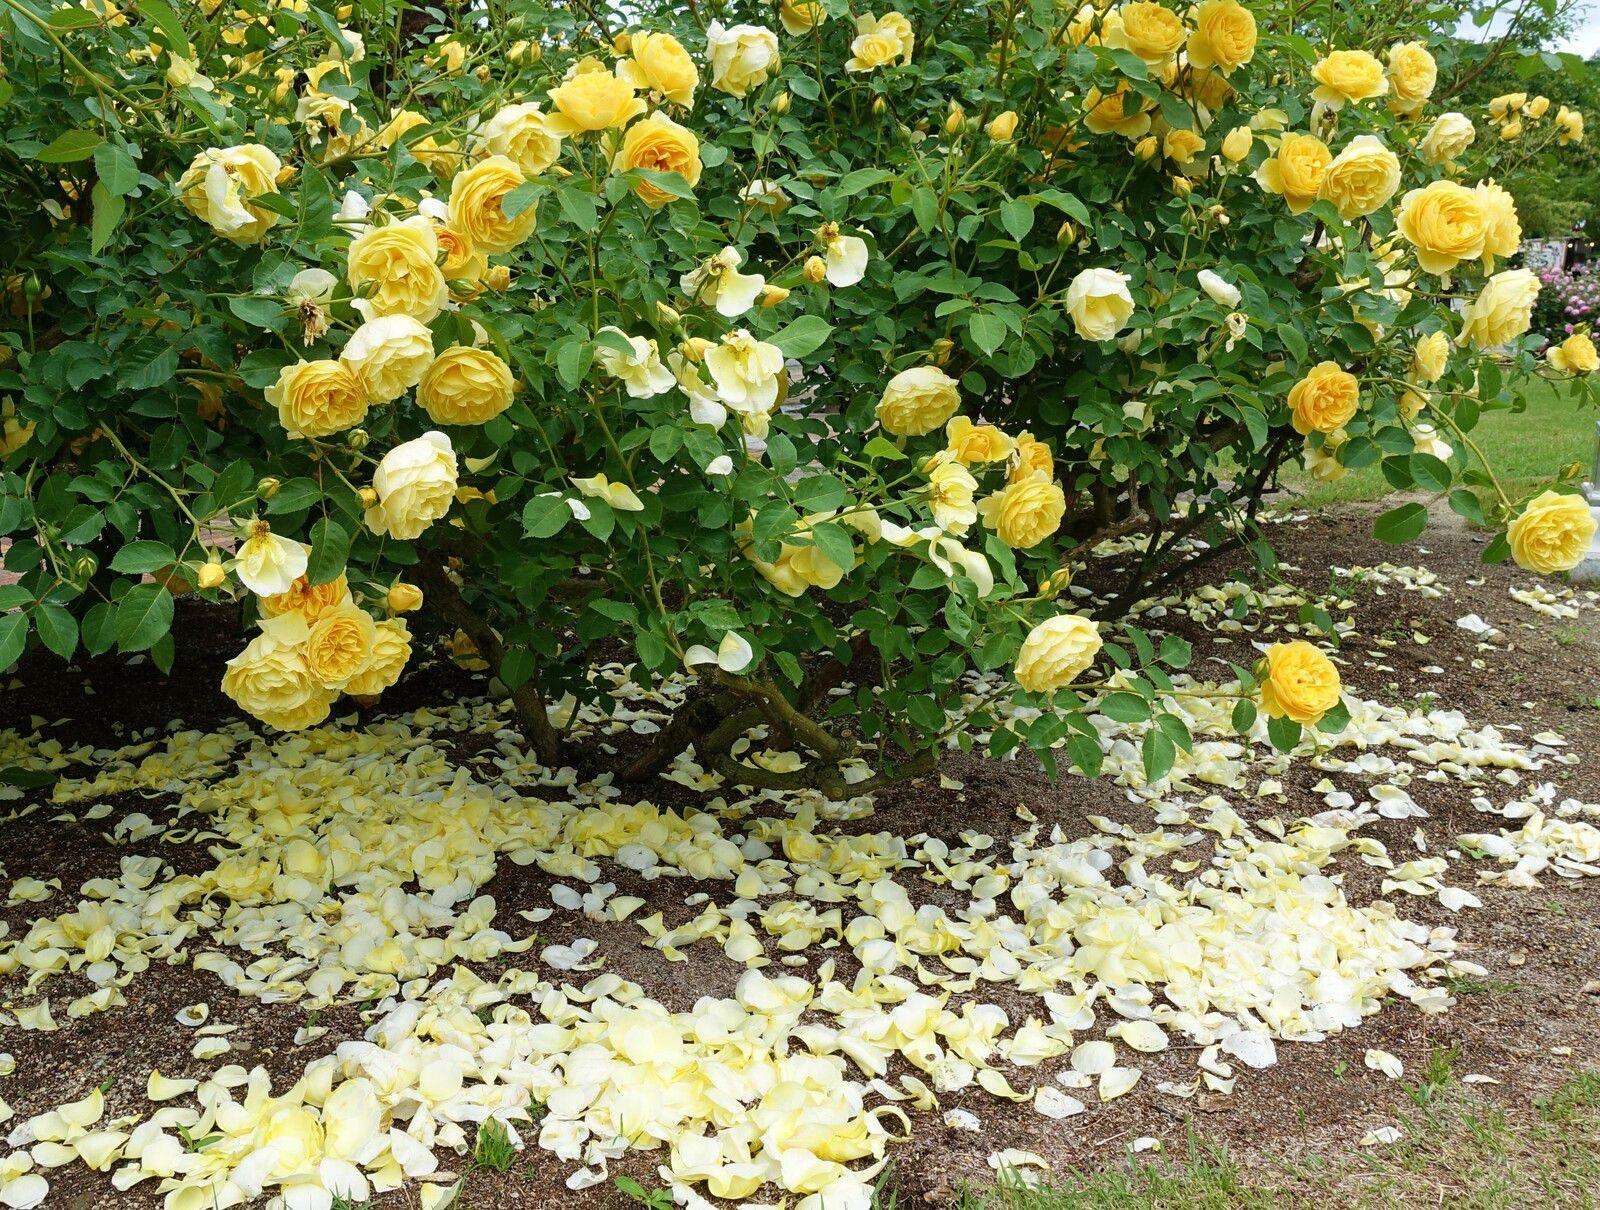 Roses et ciel ombrageux - Hana Festa 2021